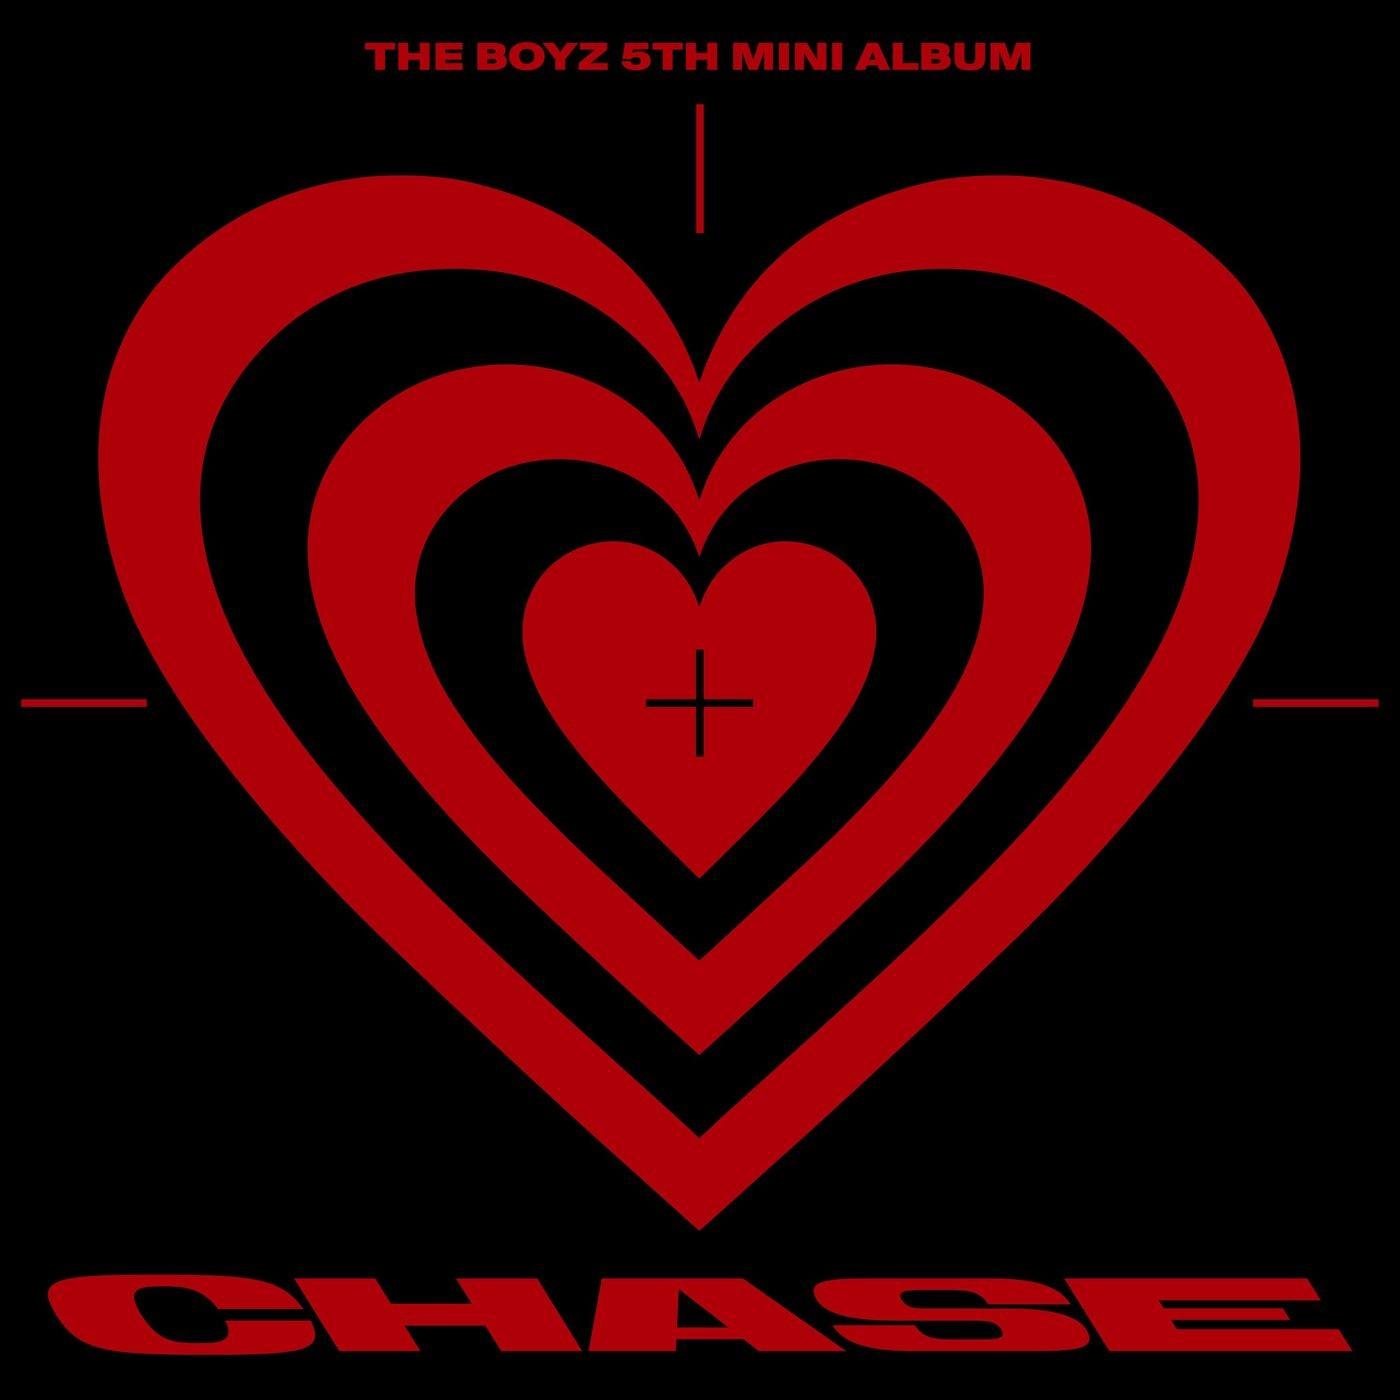 THE BOYZ (더보이즈) – CHASE [FLAC + MP3 320 / WEB] [2020.09.21]